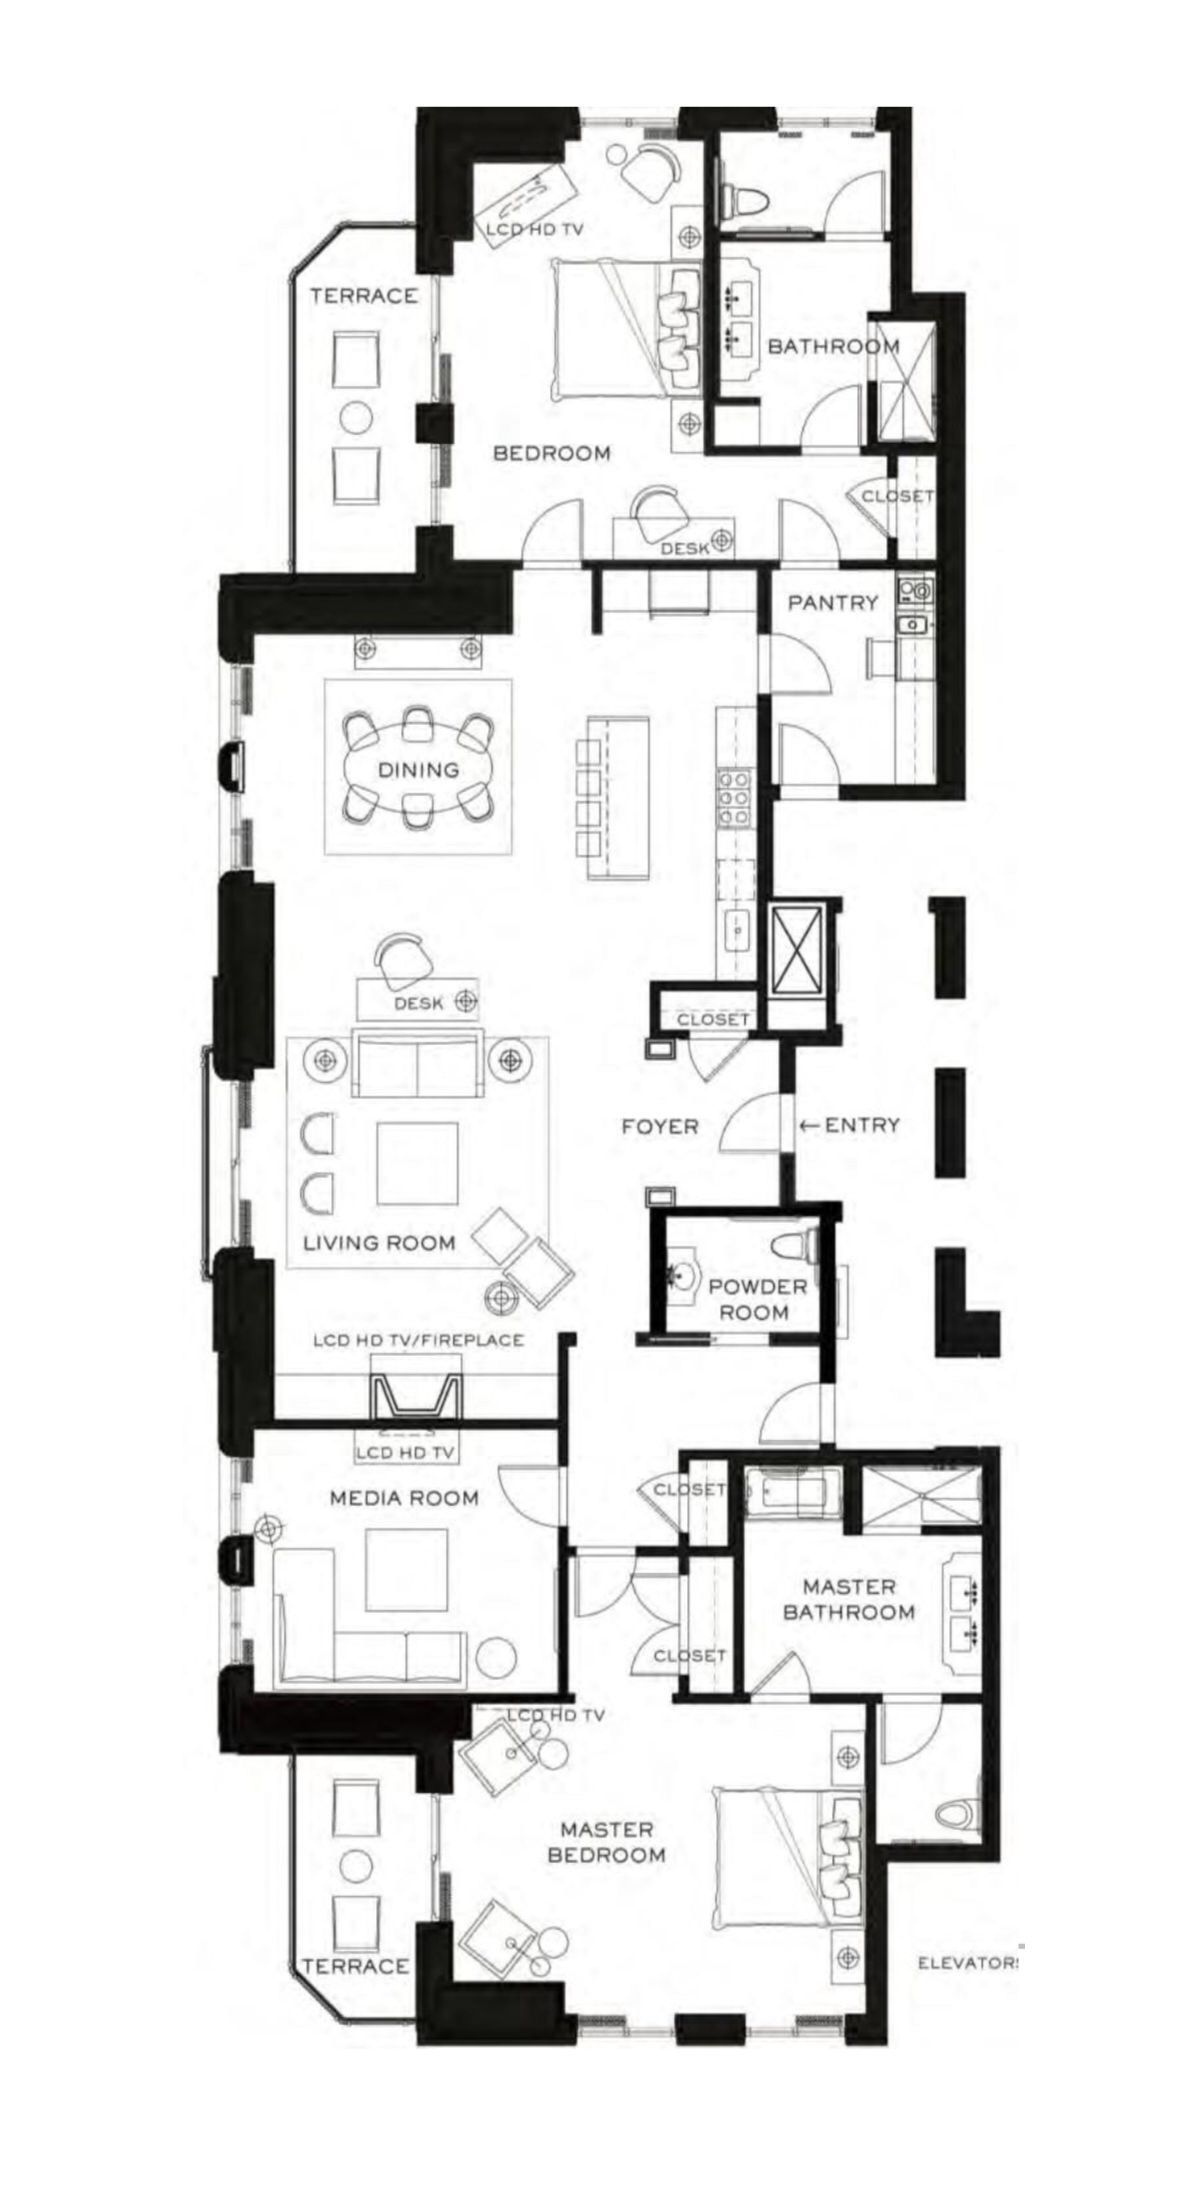 Waldorf Astoria Chicago Presidential Suite 2130 Sq Ft In 2020 Hotel Floor Plan Luxury Hotel Room Hotel Plan